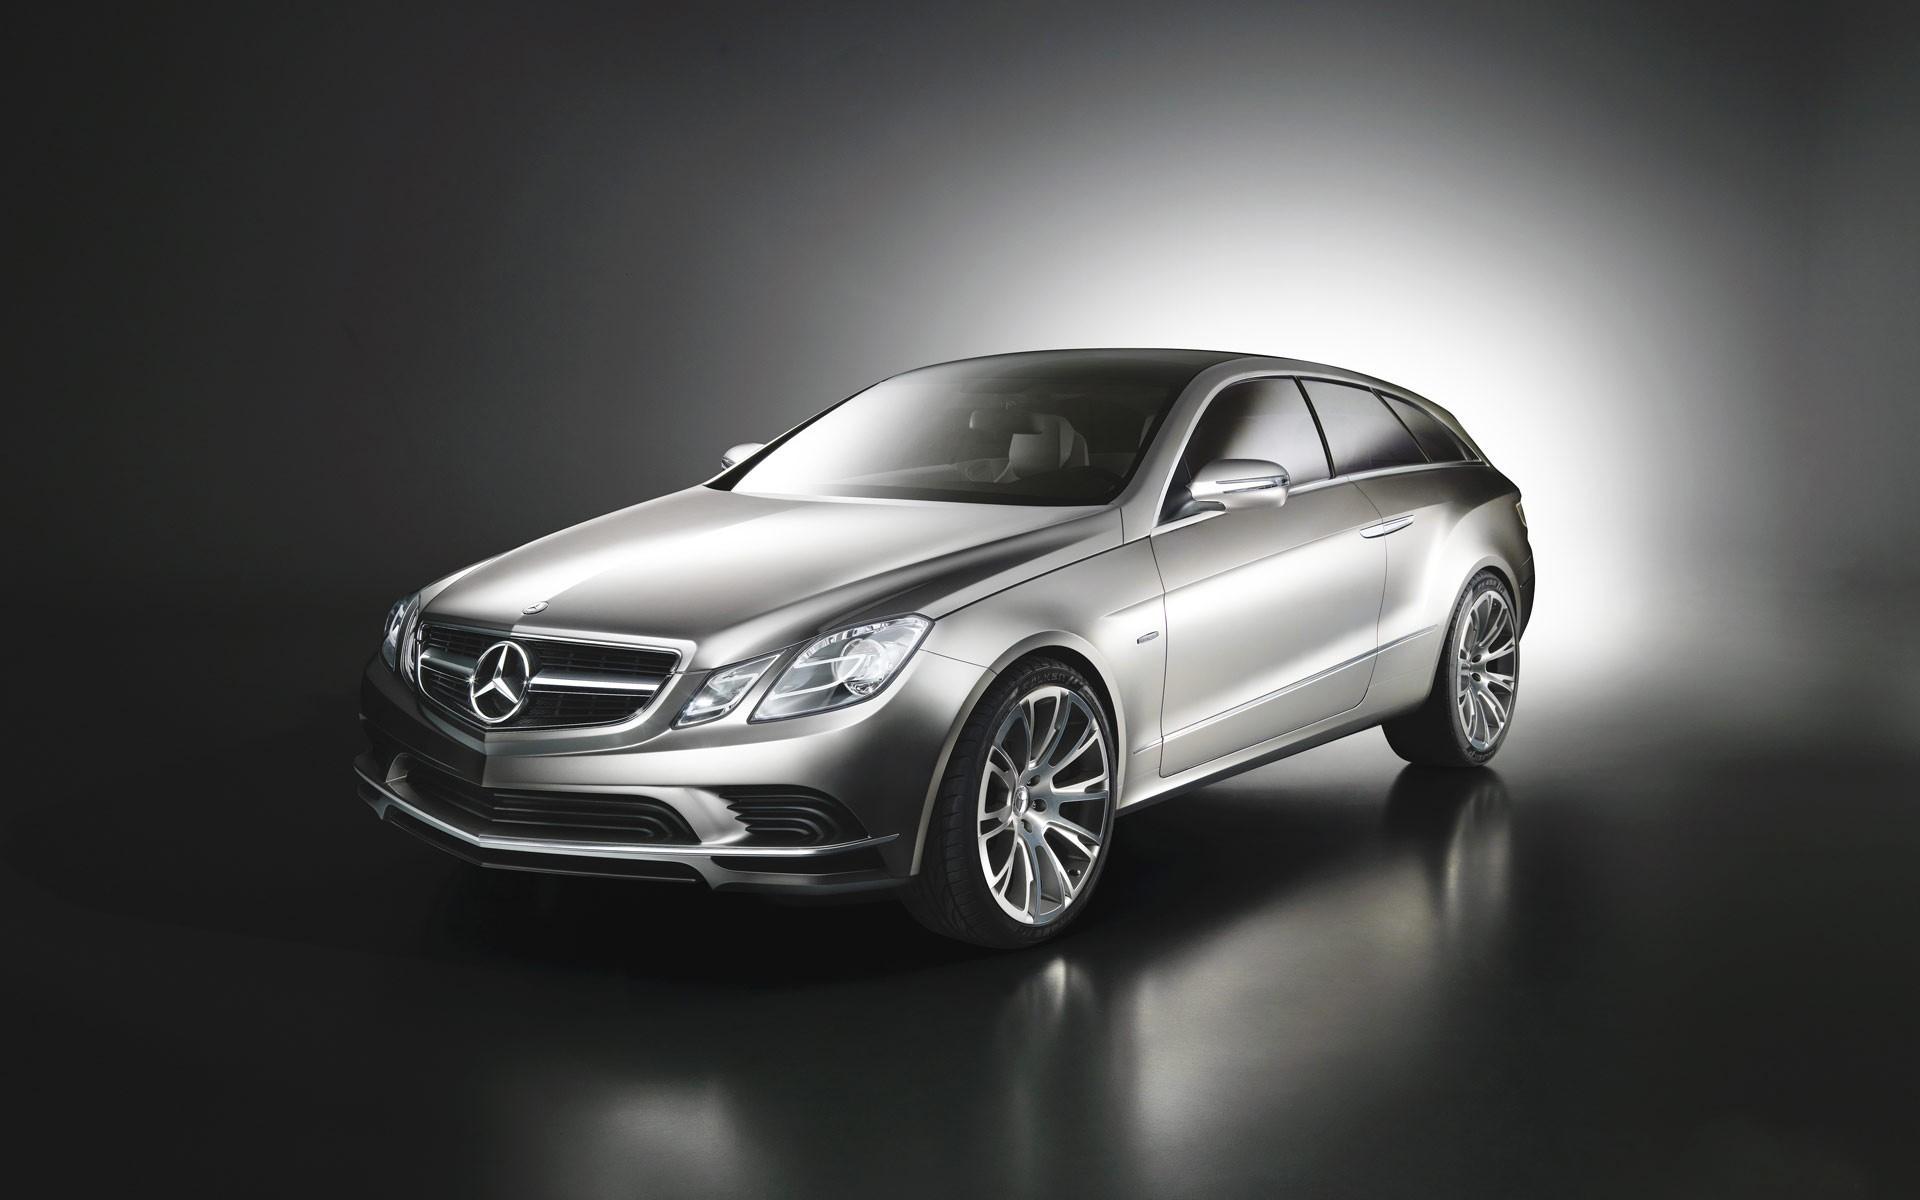 Mercedes concept бесплатно